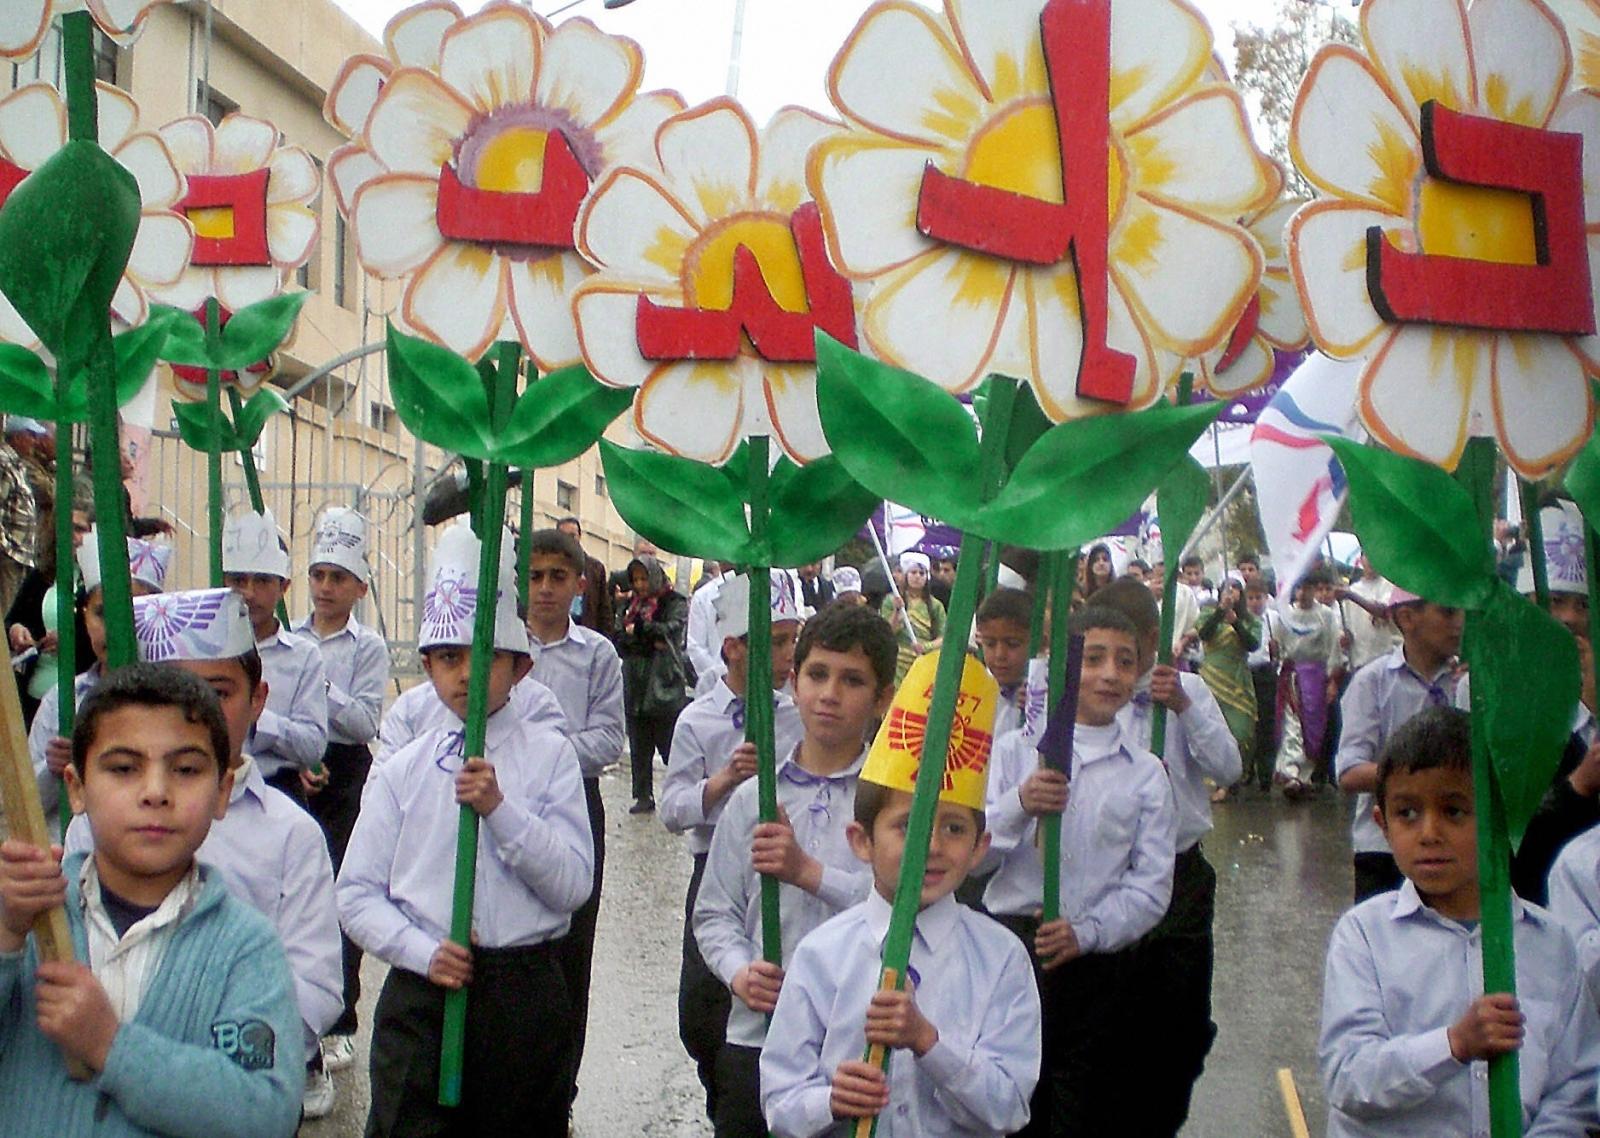 Assyrian children